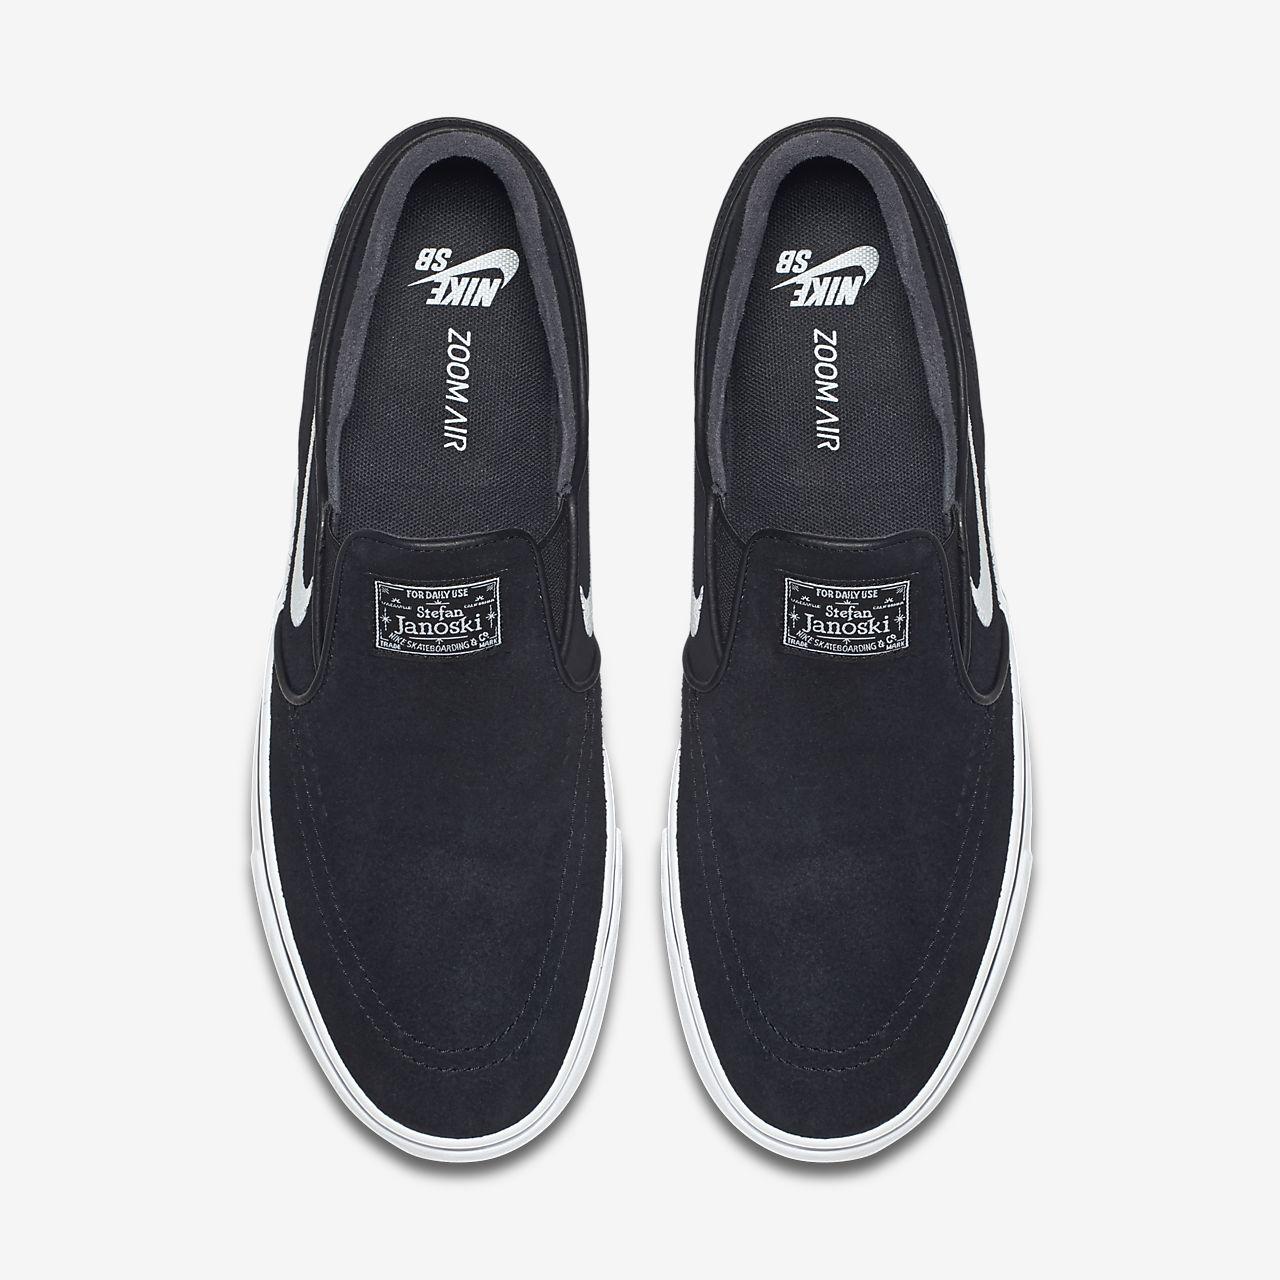 online retailer 1fe8b 056eb ... Nike SB Zoom Stefan Janoski Slip-On Men s Skateboarding Shoe